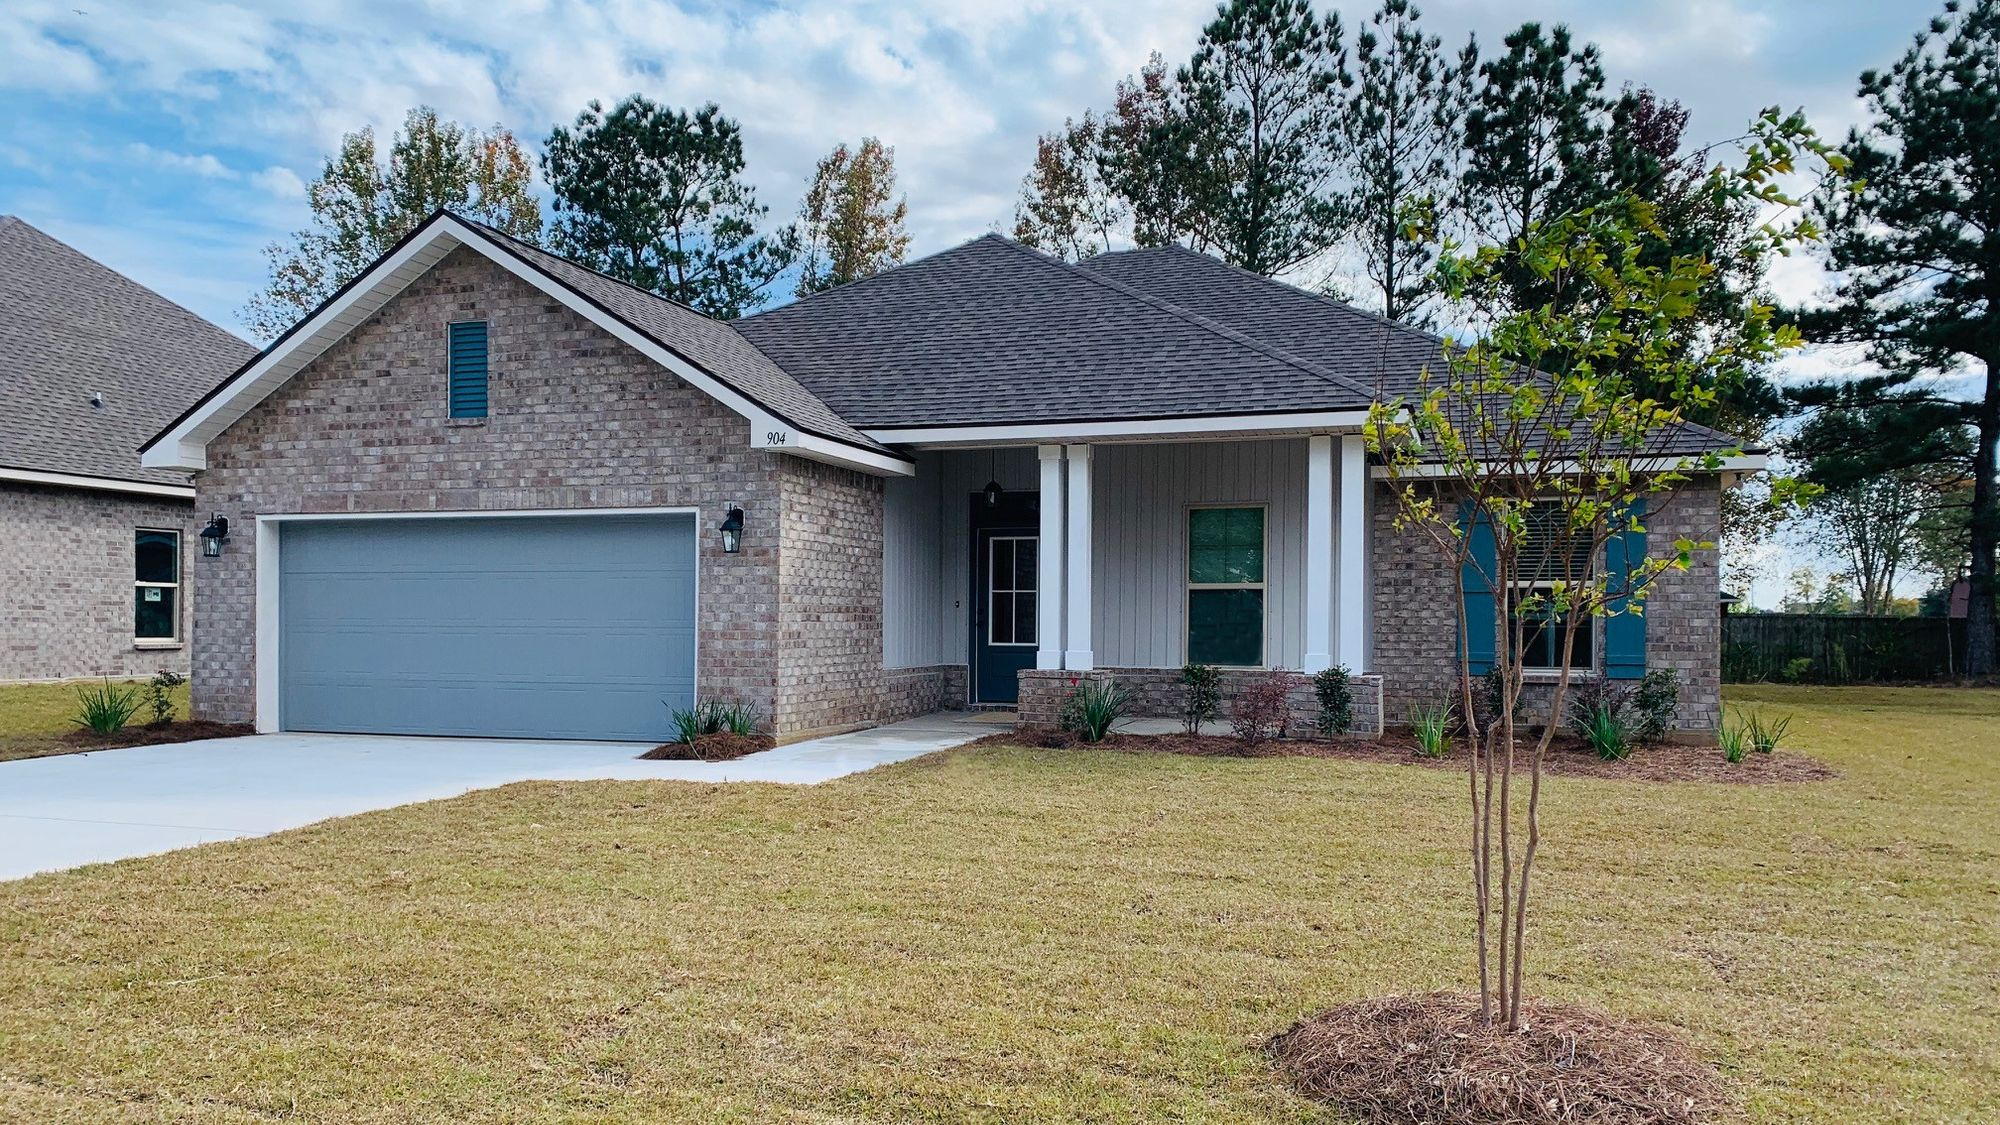 Lafayette Place Model Home- Alabama- DSLD Homes